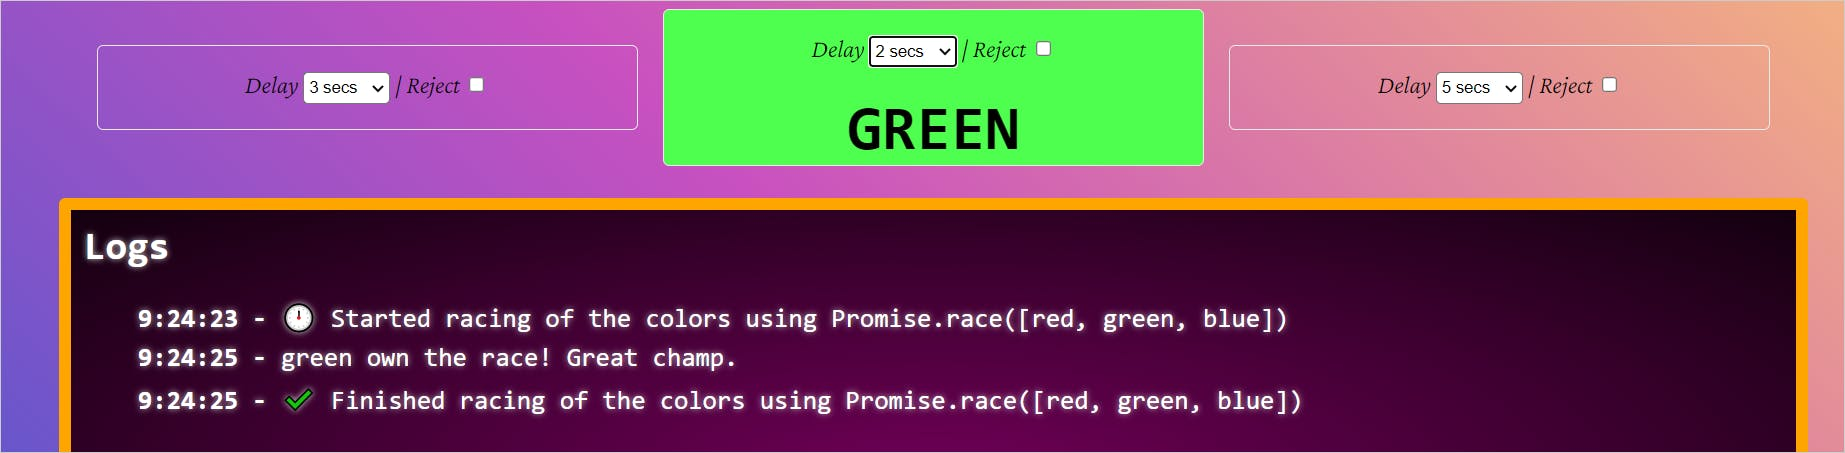 race green wins